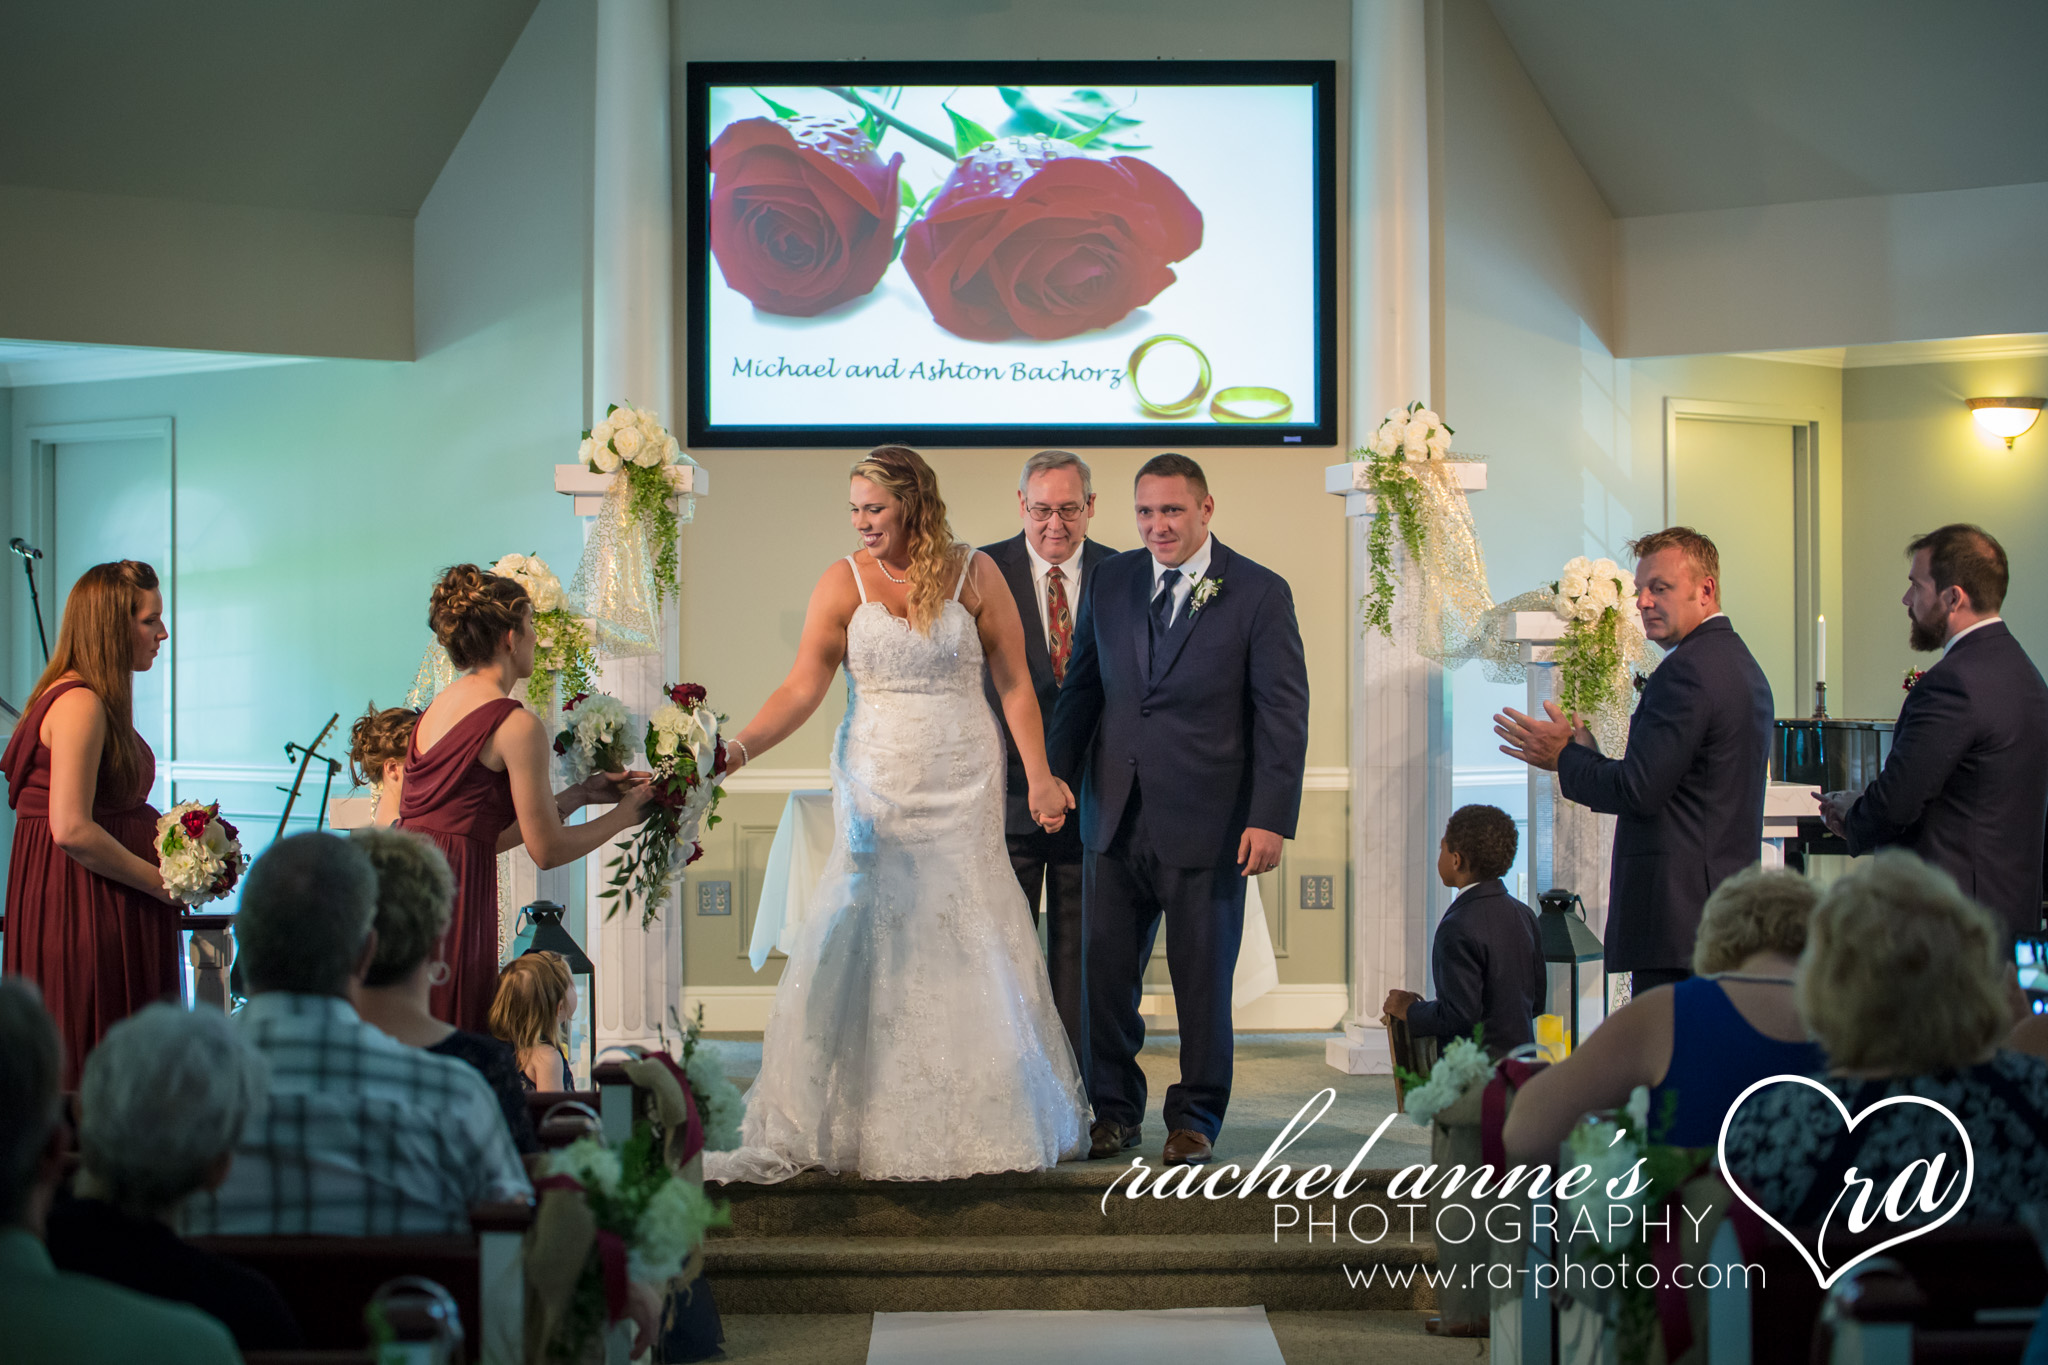 036-MAB-TREASURE-LAKE-CHURCH-LODGE-PA-WEDDINGS.jpg